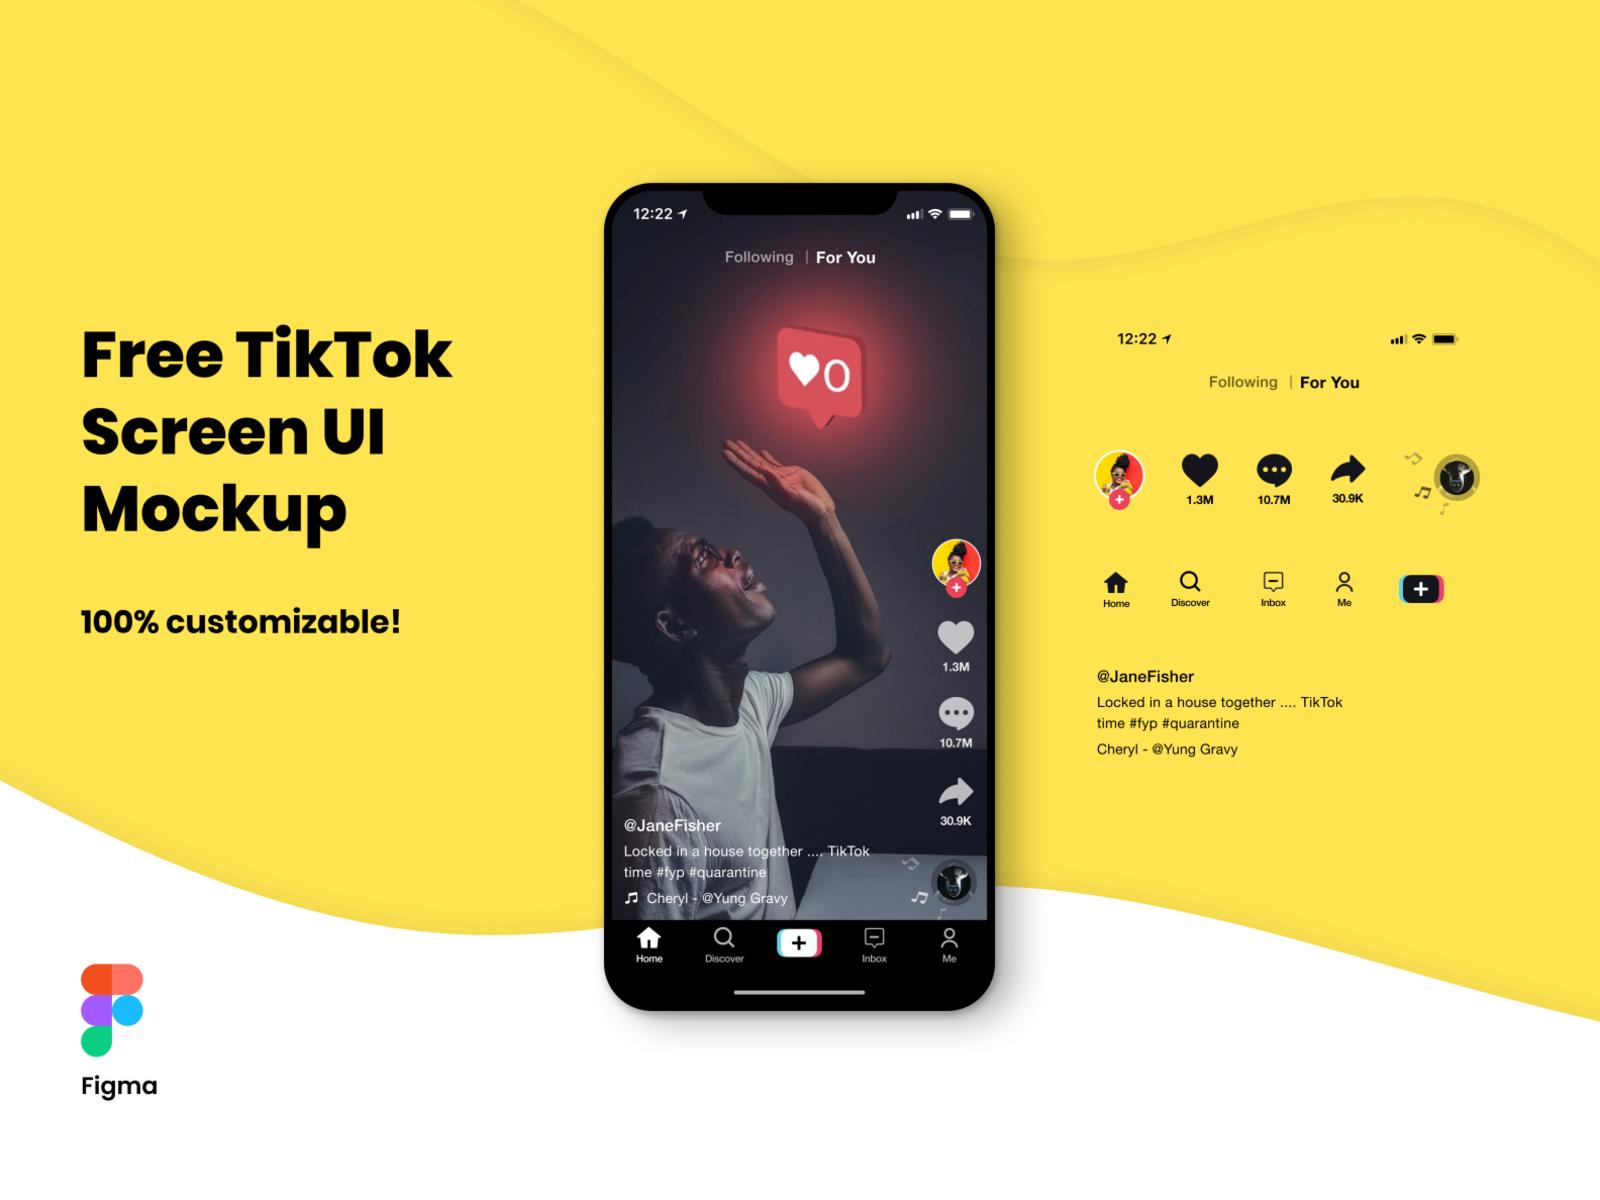 FREE TikTok Screen UI Mockup for Figma cover image